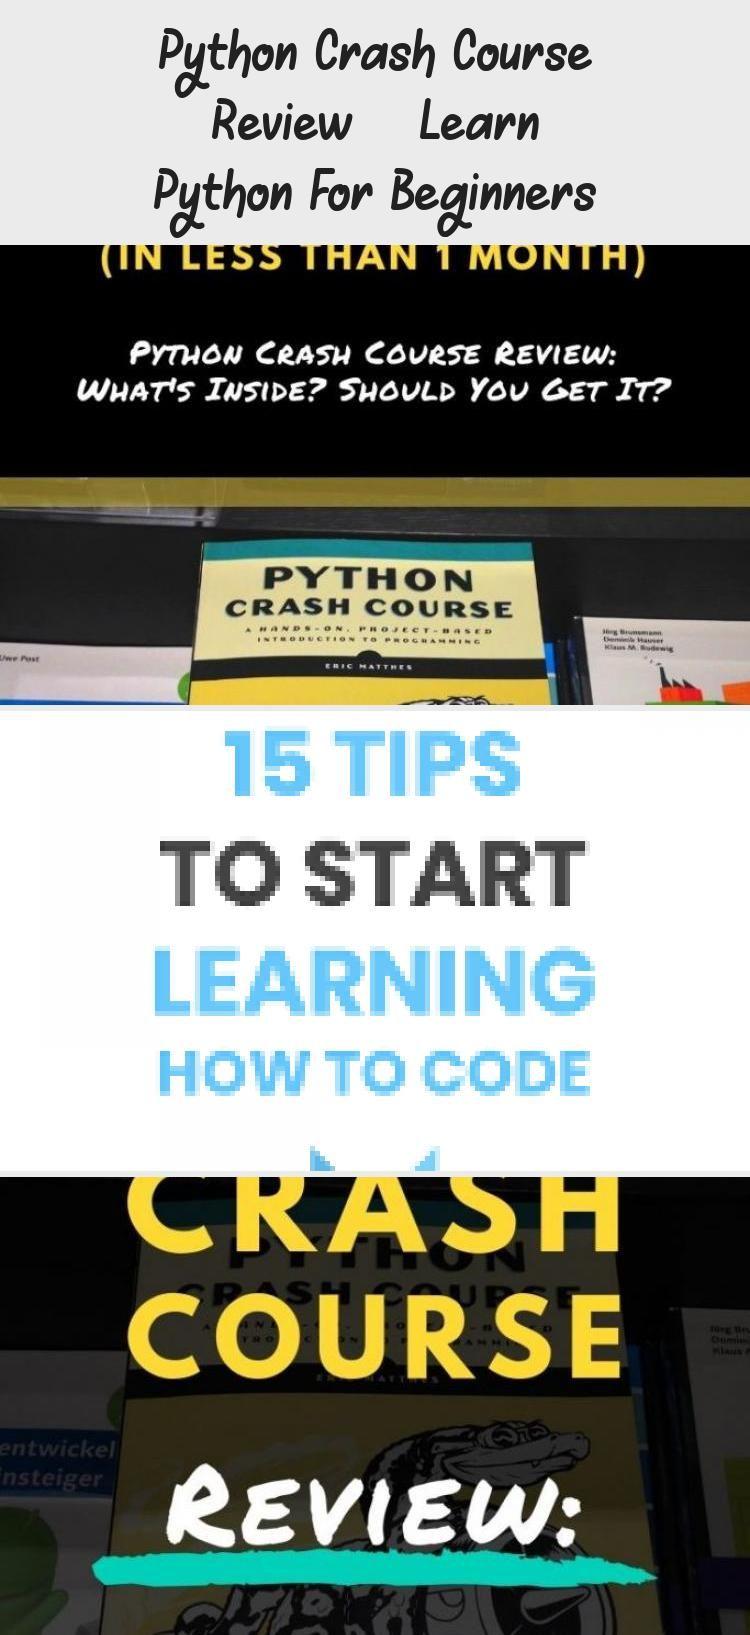 Python Crash Course Review Learn Python For Beginners Technology Crash Course Course Review Learn Web Development